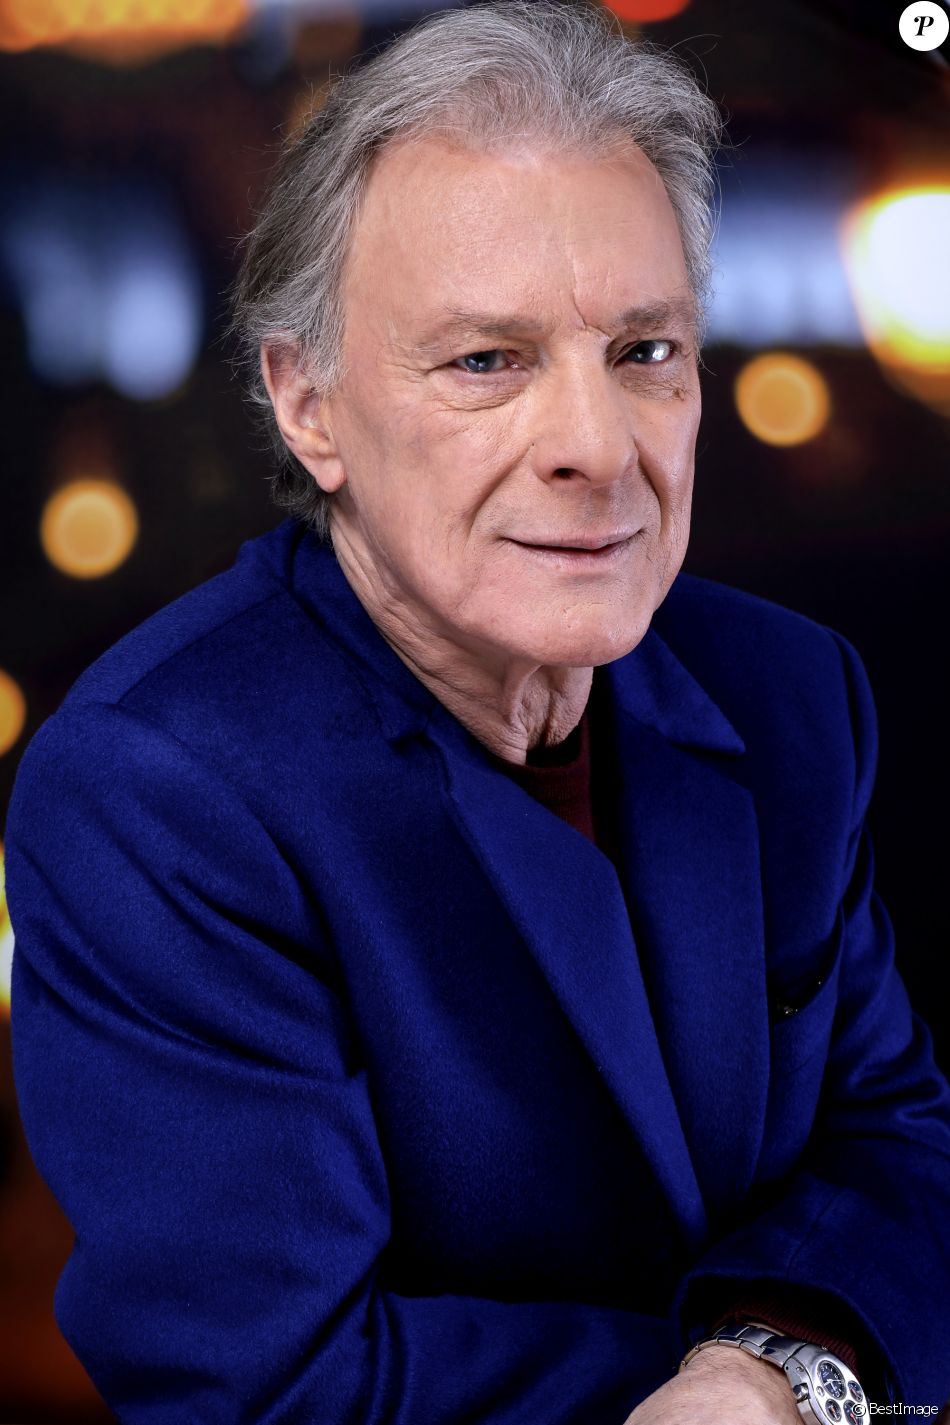 Portrait de Herbert Léonard - Paris - octobre 2016.